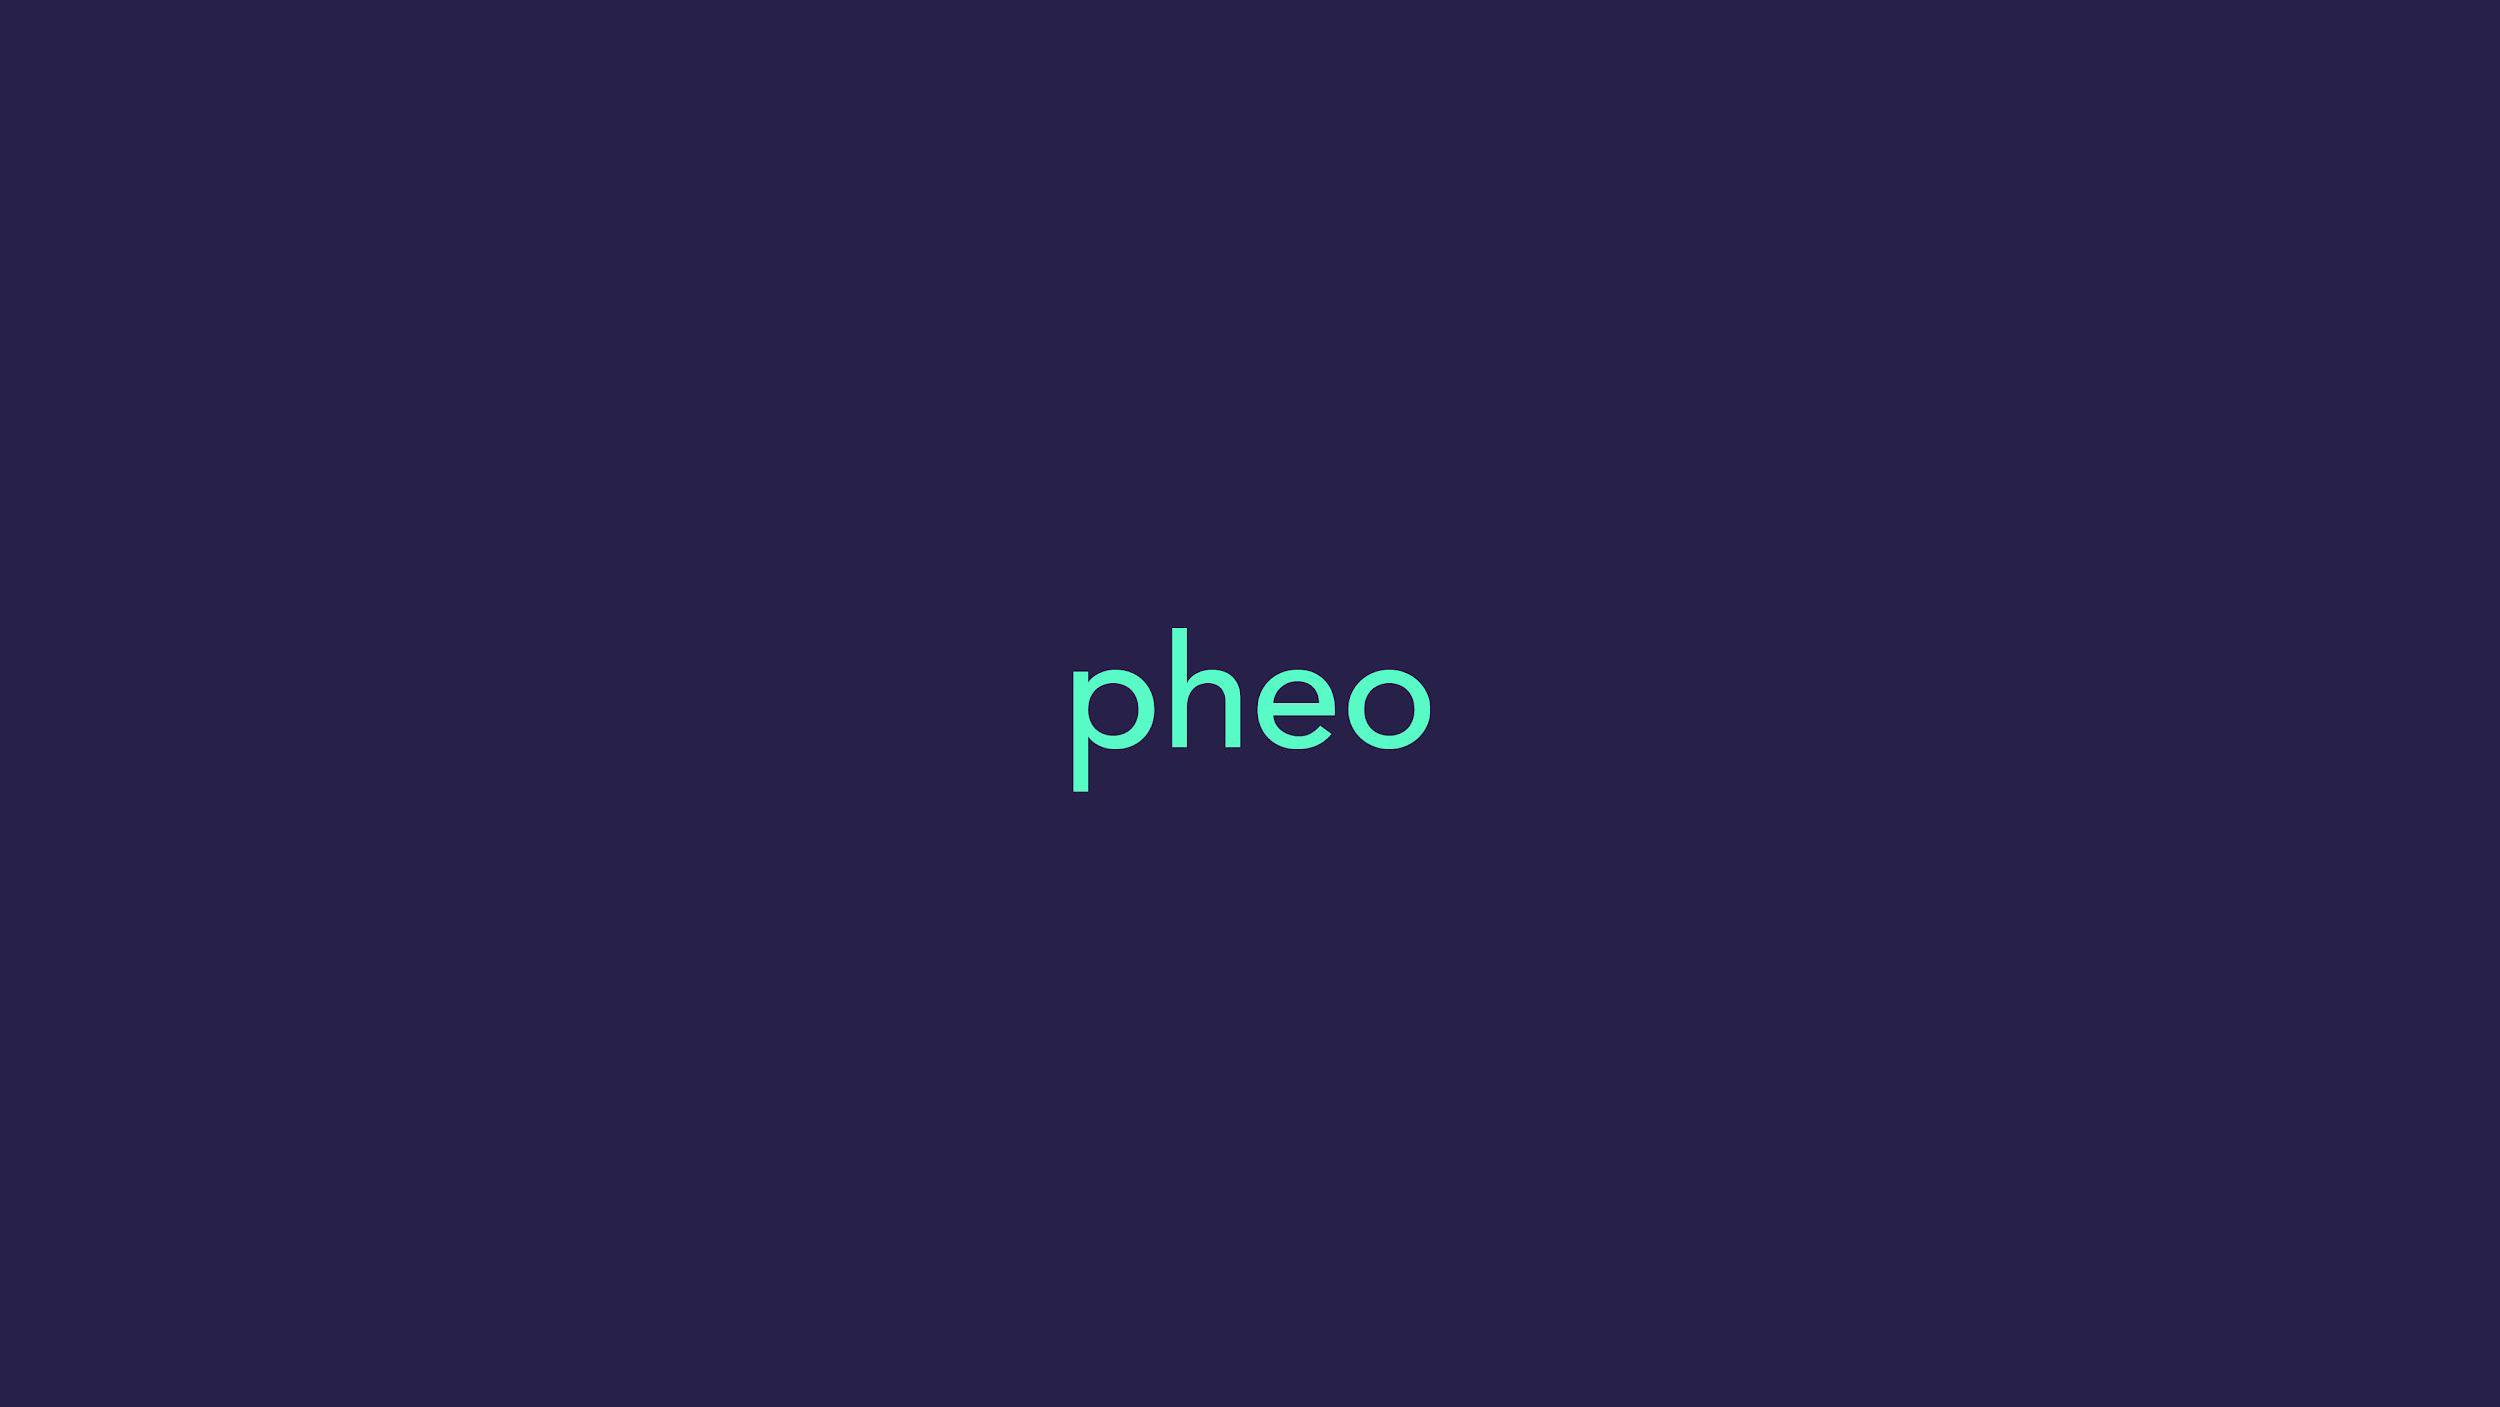 Pheo_process_Page_38.jpg